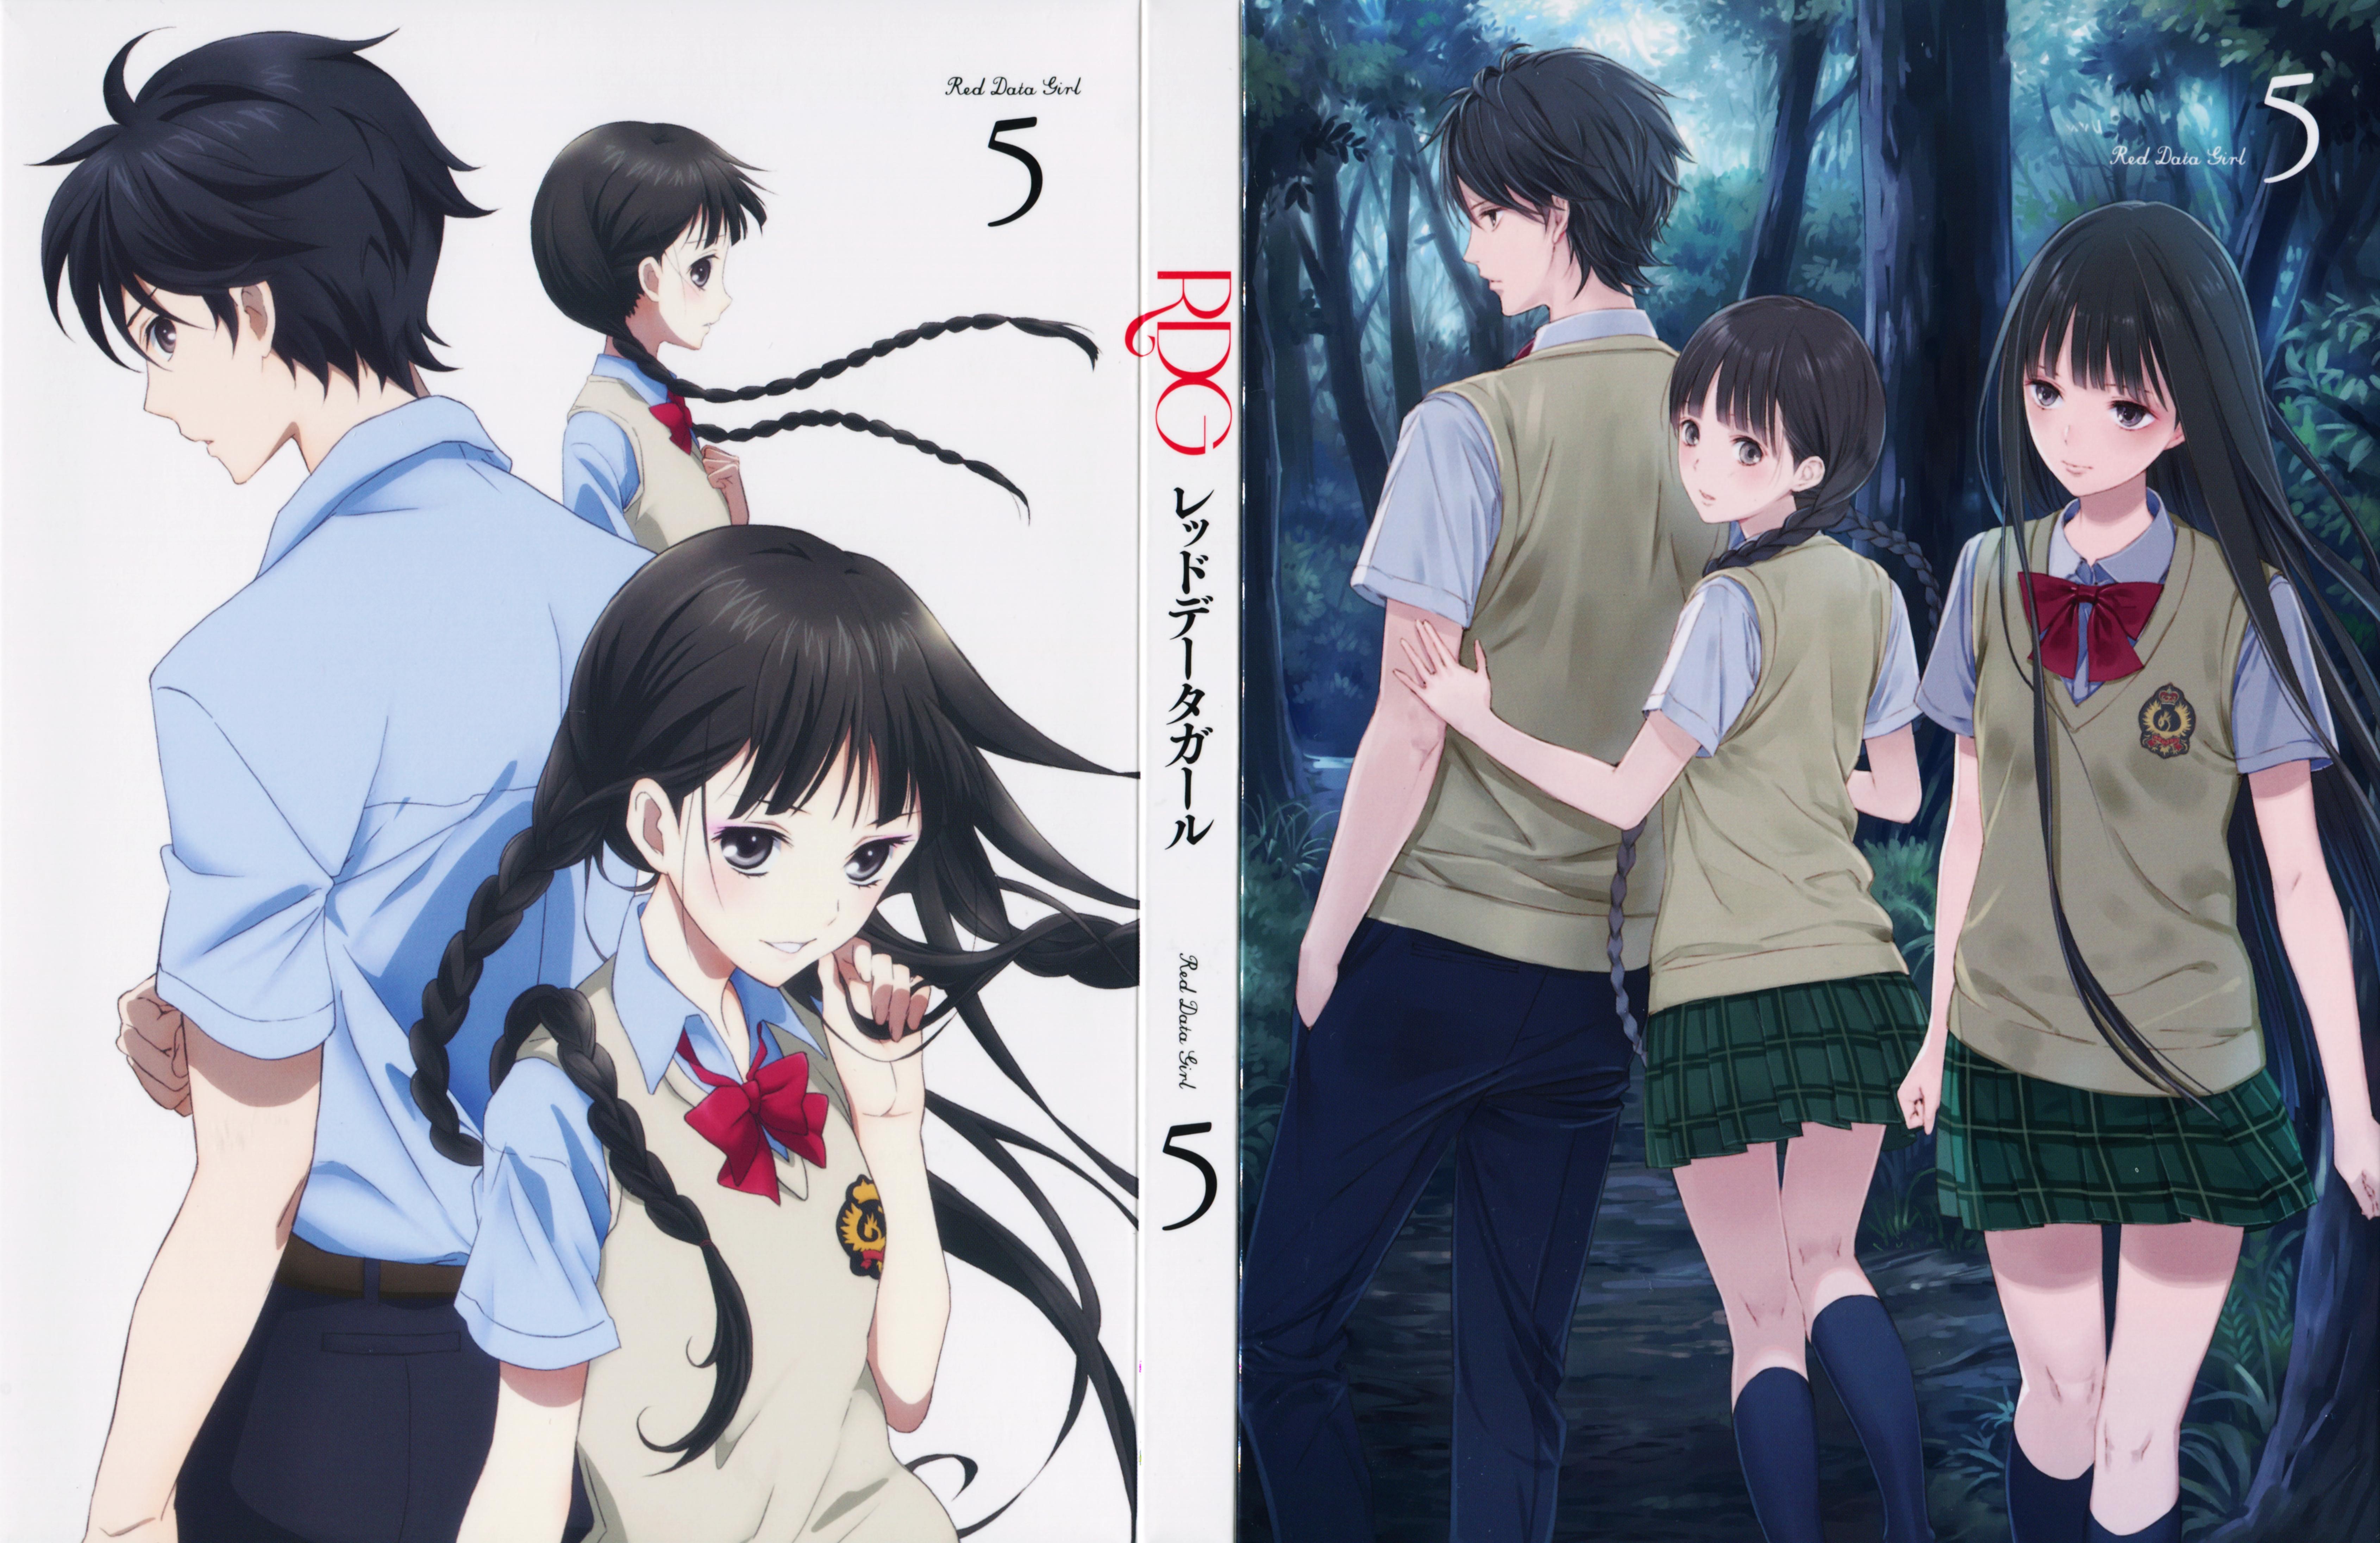 Rdg Red Data Girl Zerochan Anime Image Board